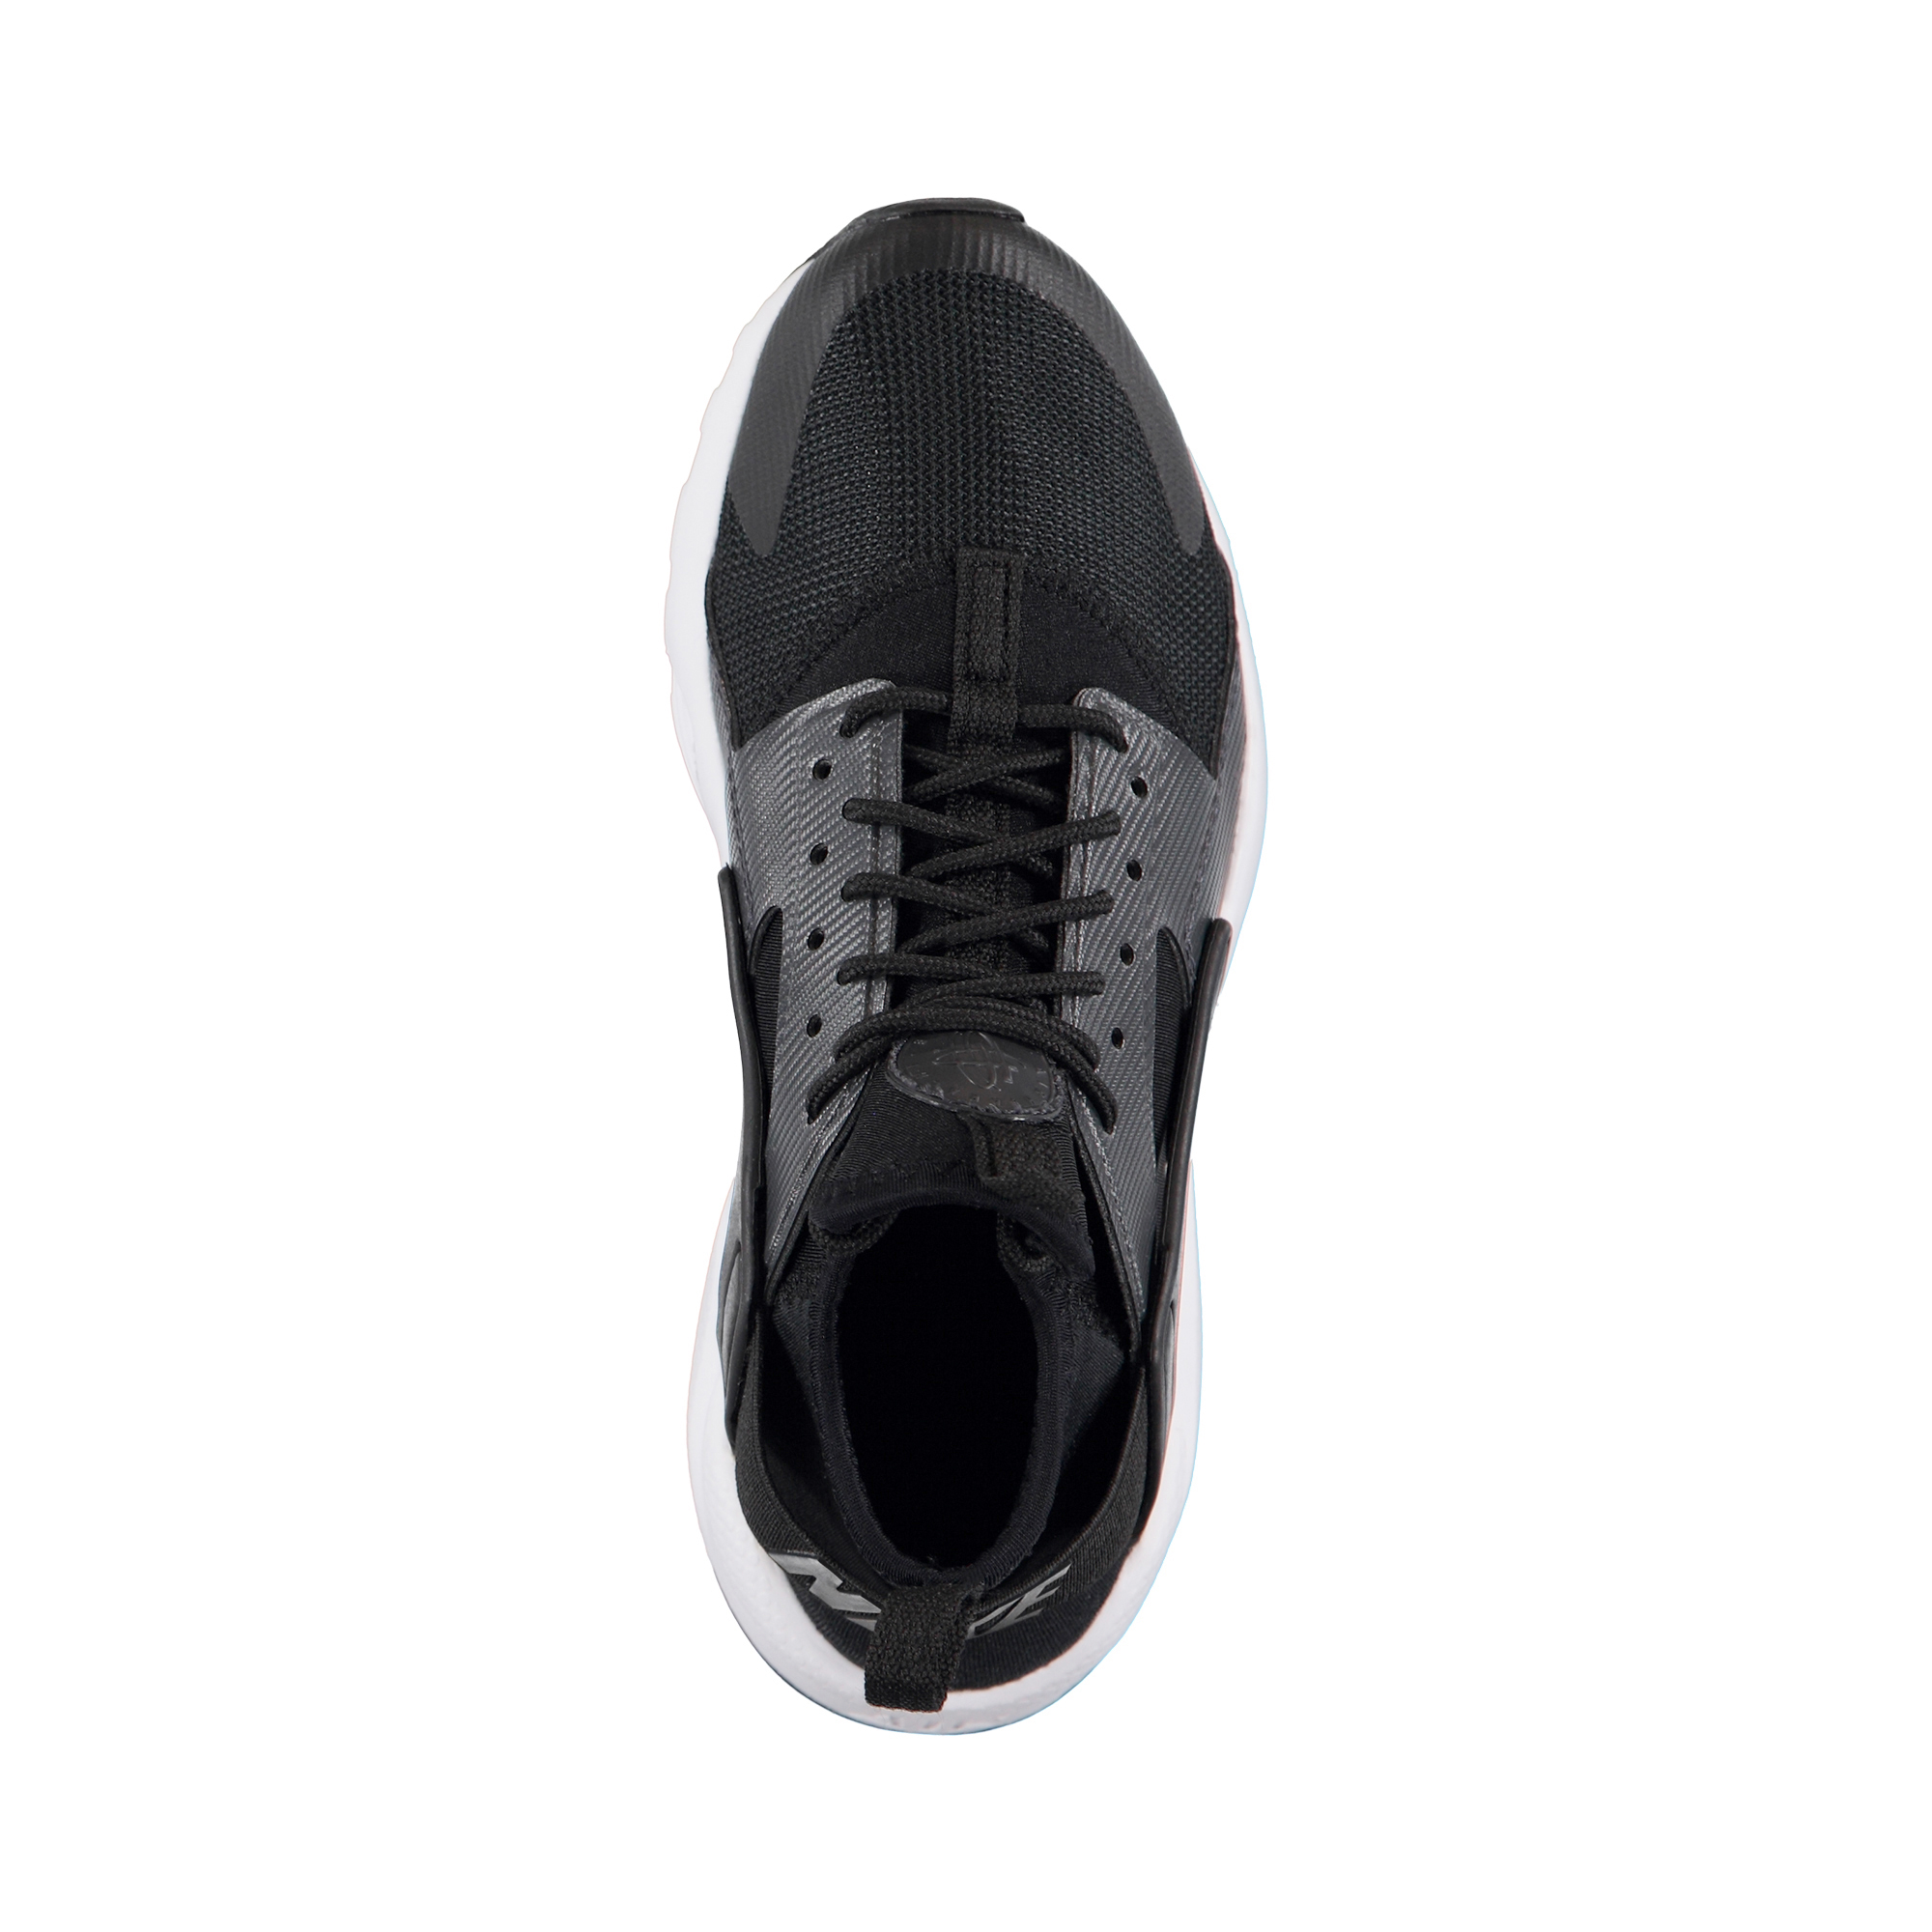 Nike Air Huarache Run Ultra Kadın Siyah Spor Ayakkabı